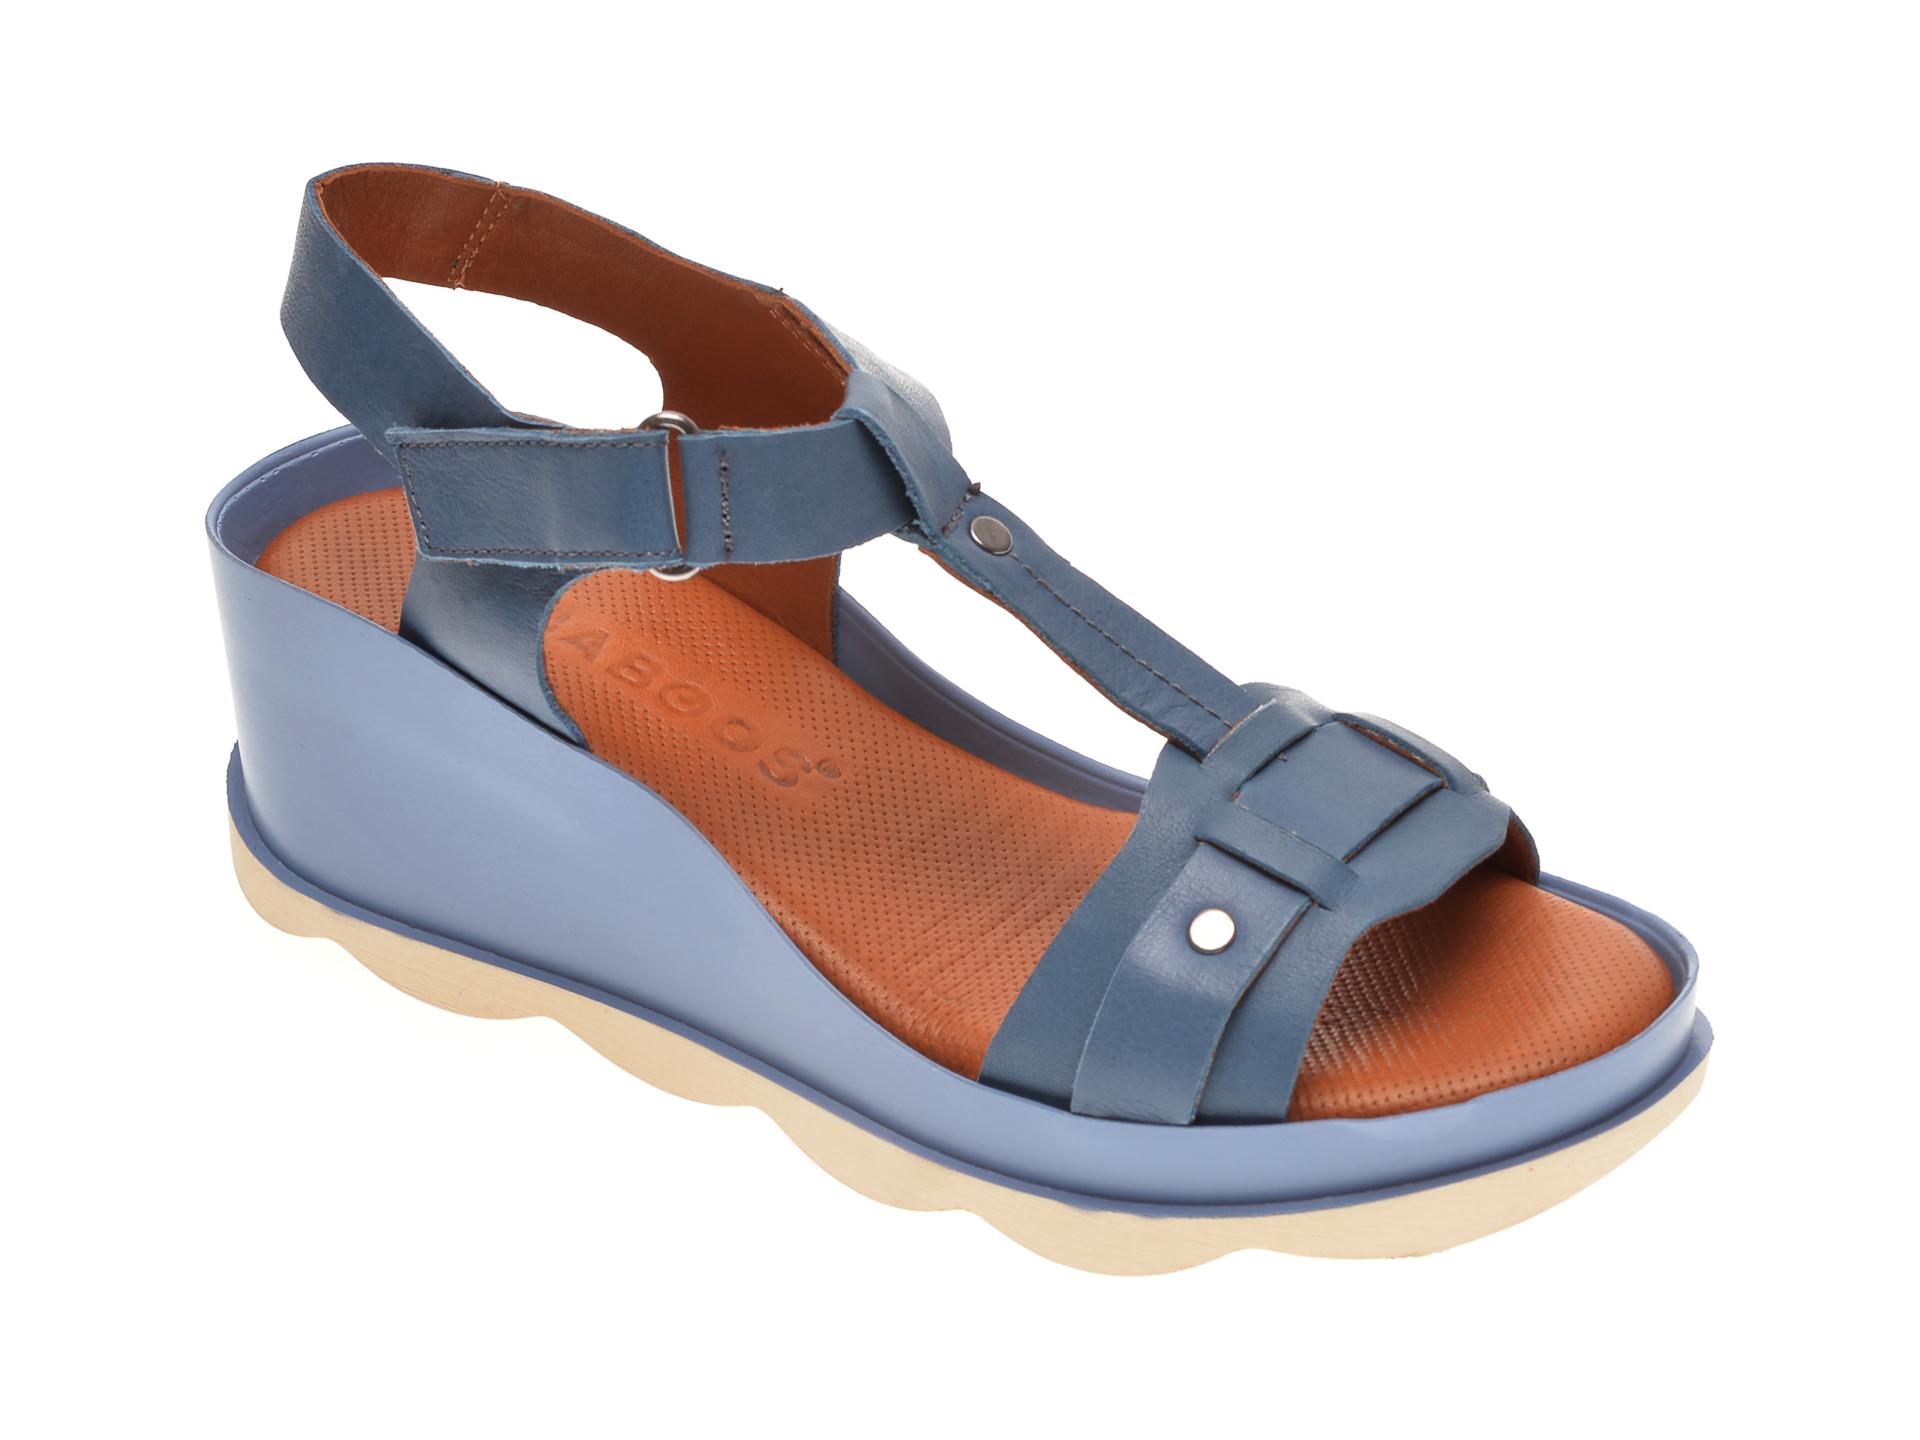 Sandale BABOOS albastre, 0502, din piele naturala imagine